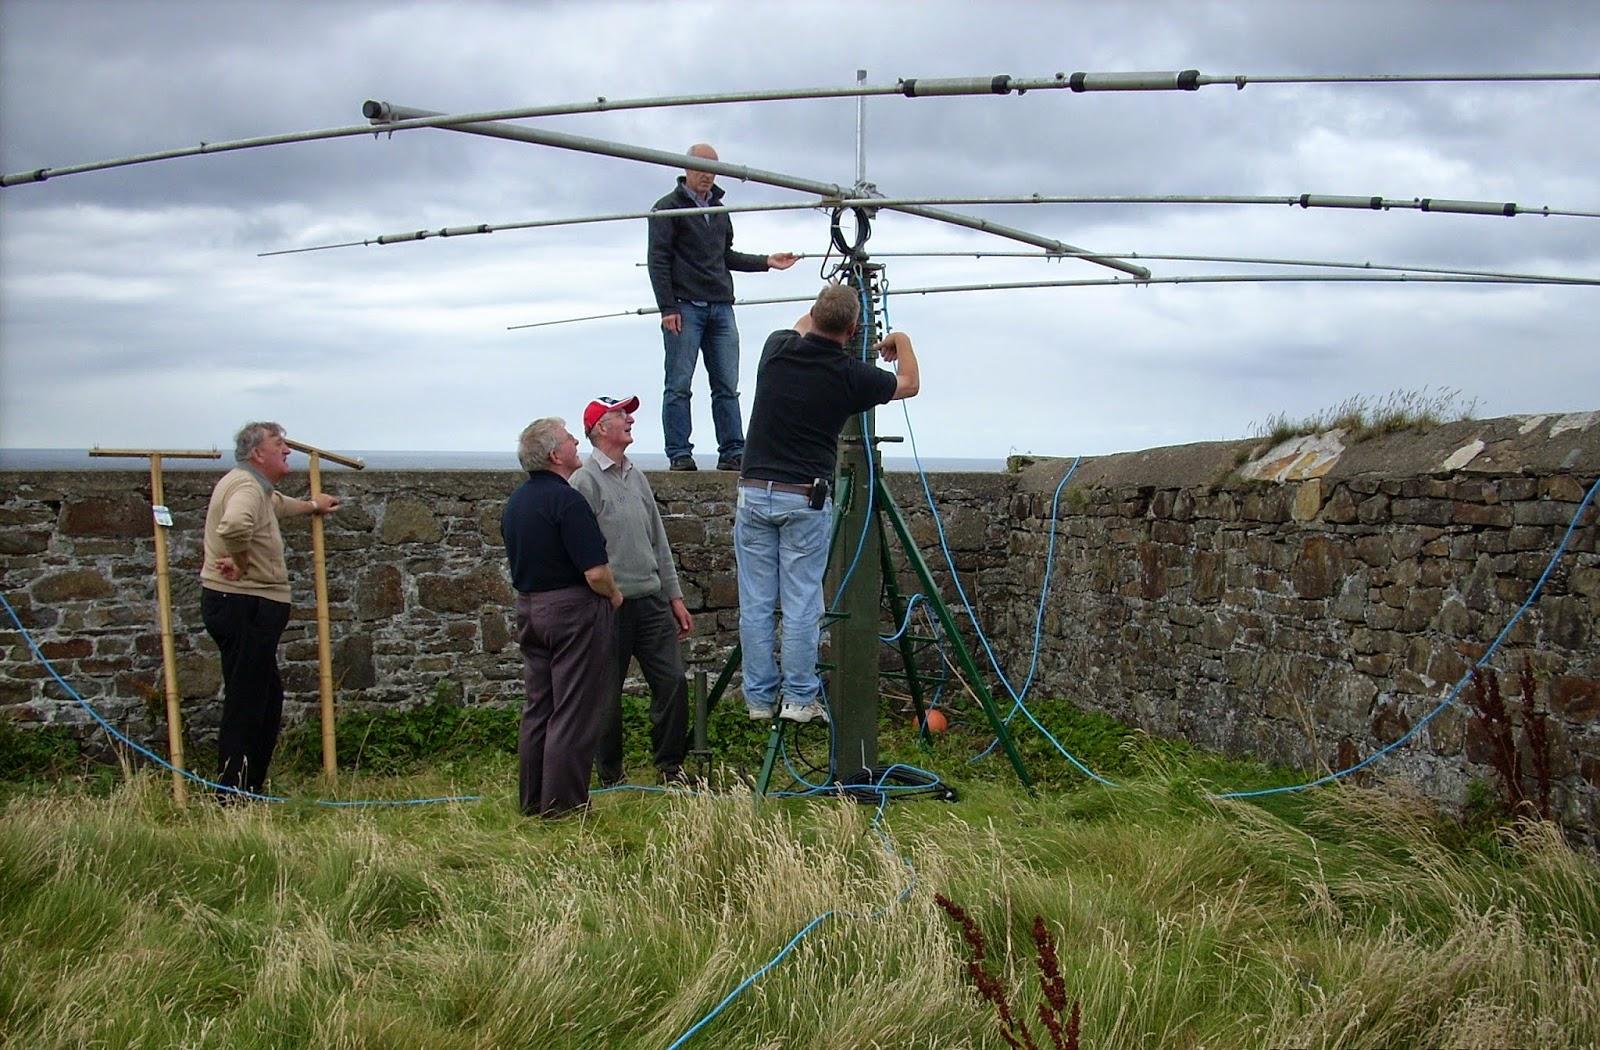 Ham radio users light up the airwaves at Loop Head